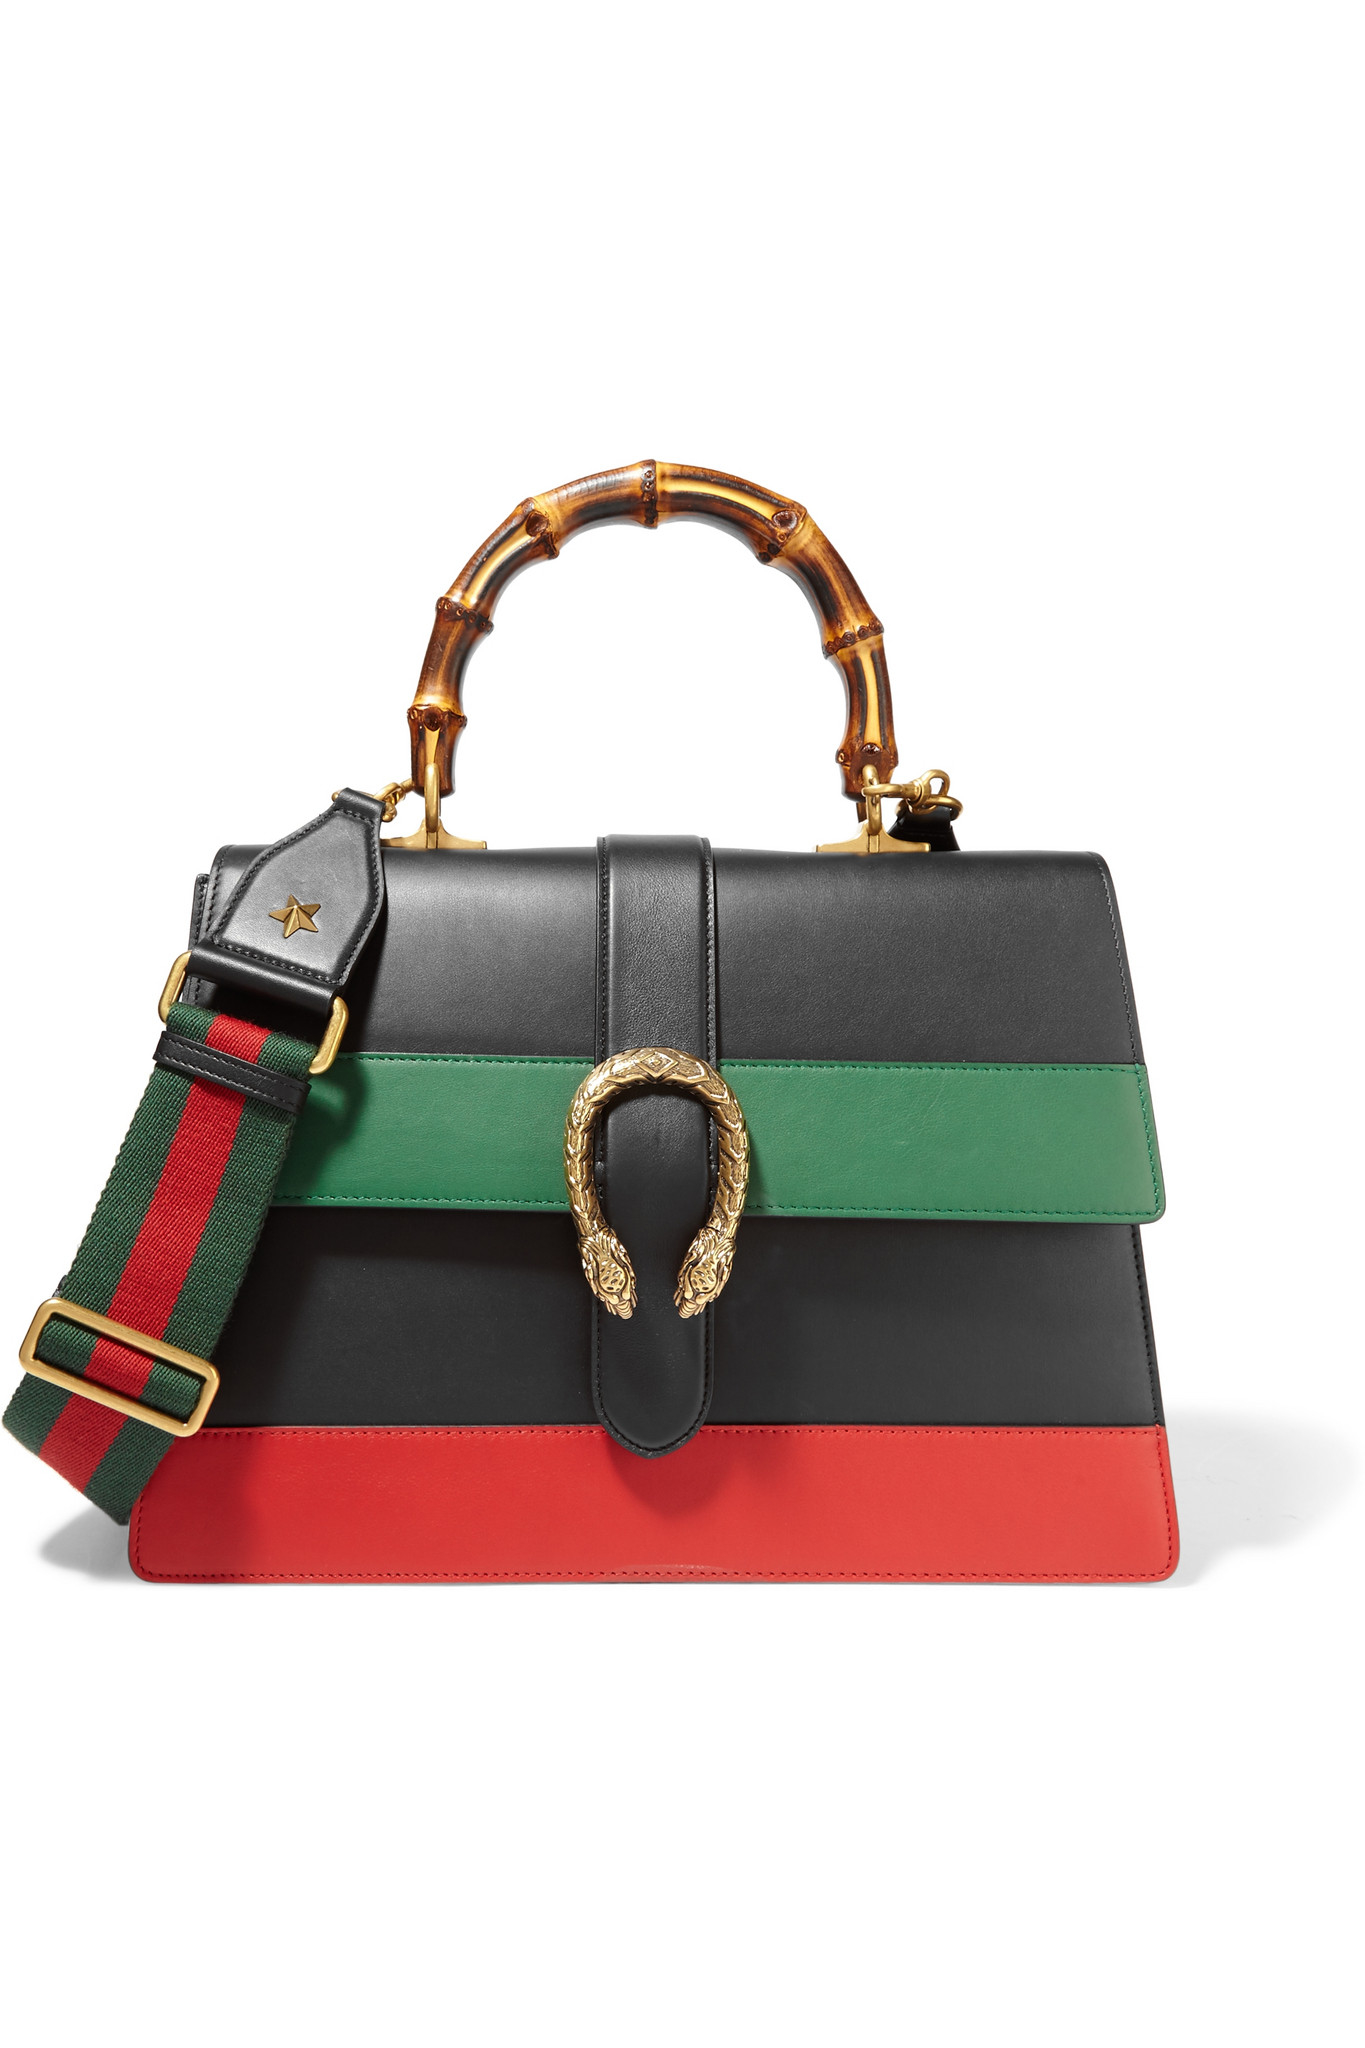 1747aca68906 Gucci Dionysus Large Paneled Leather Shoulder Bag in Black - Lyst